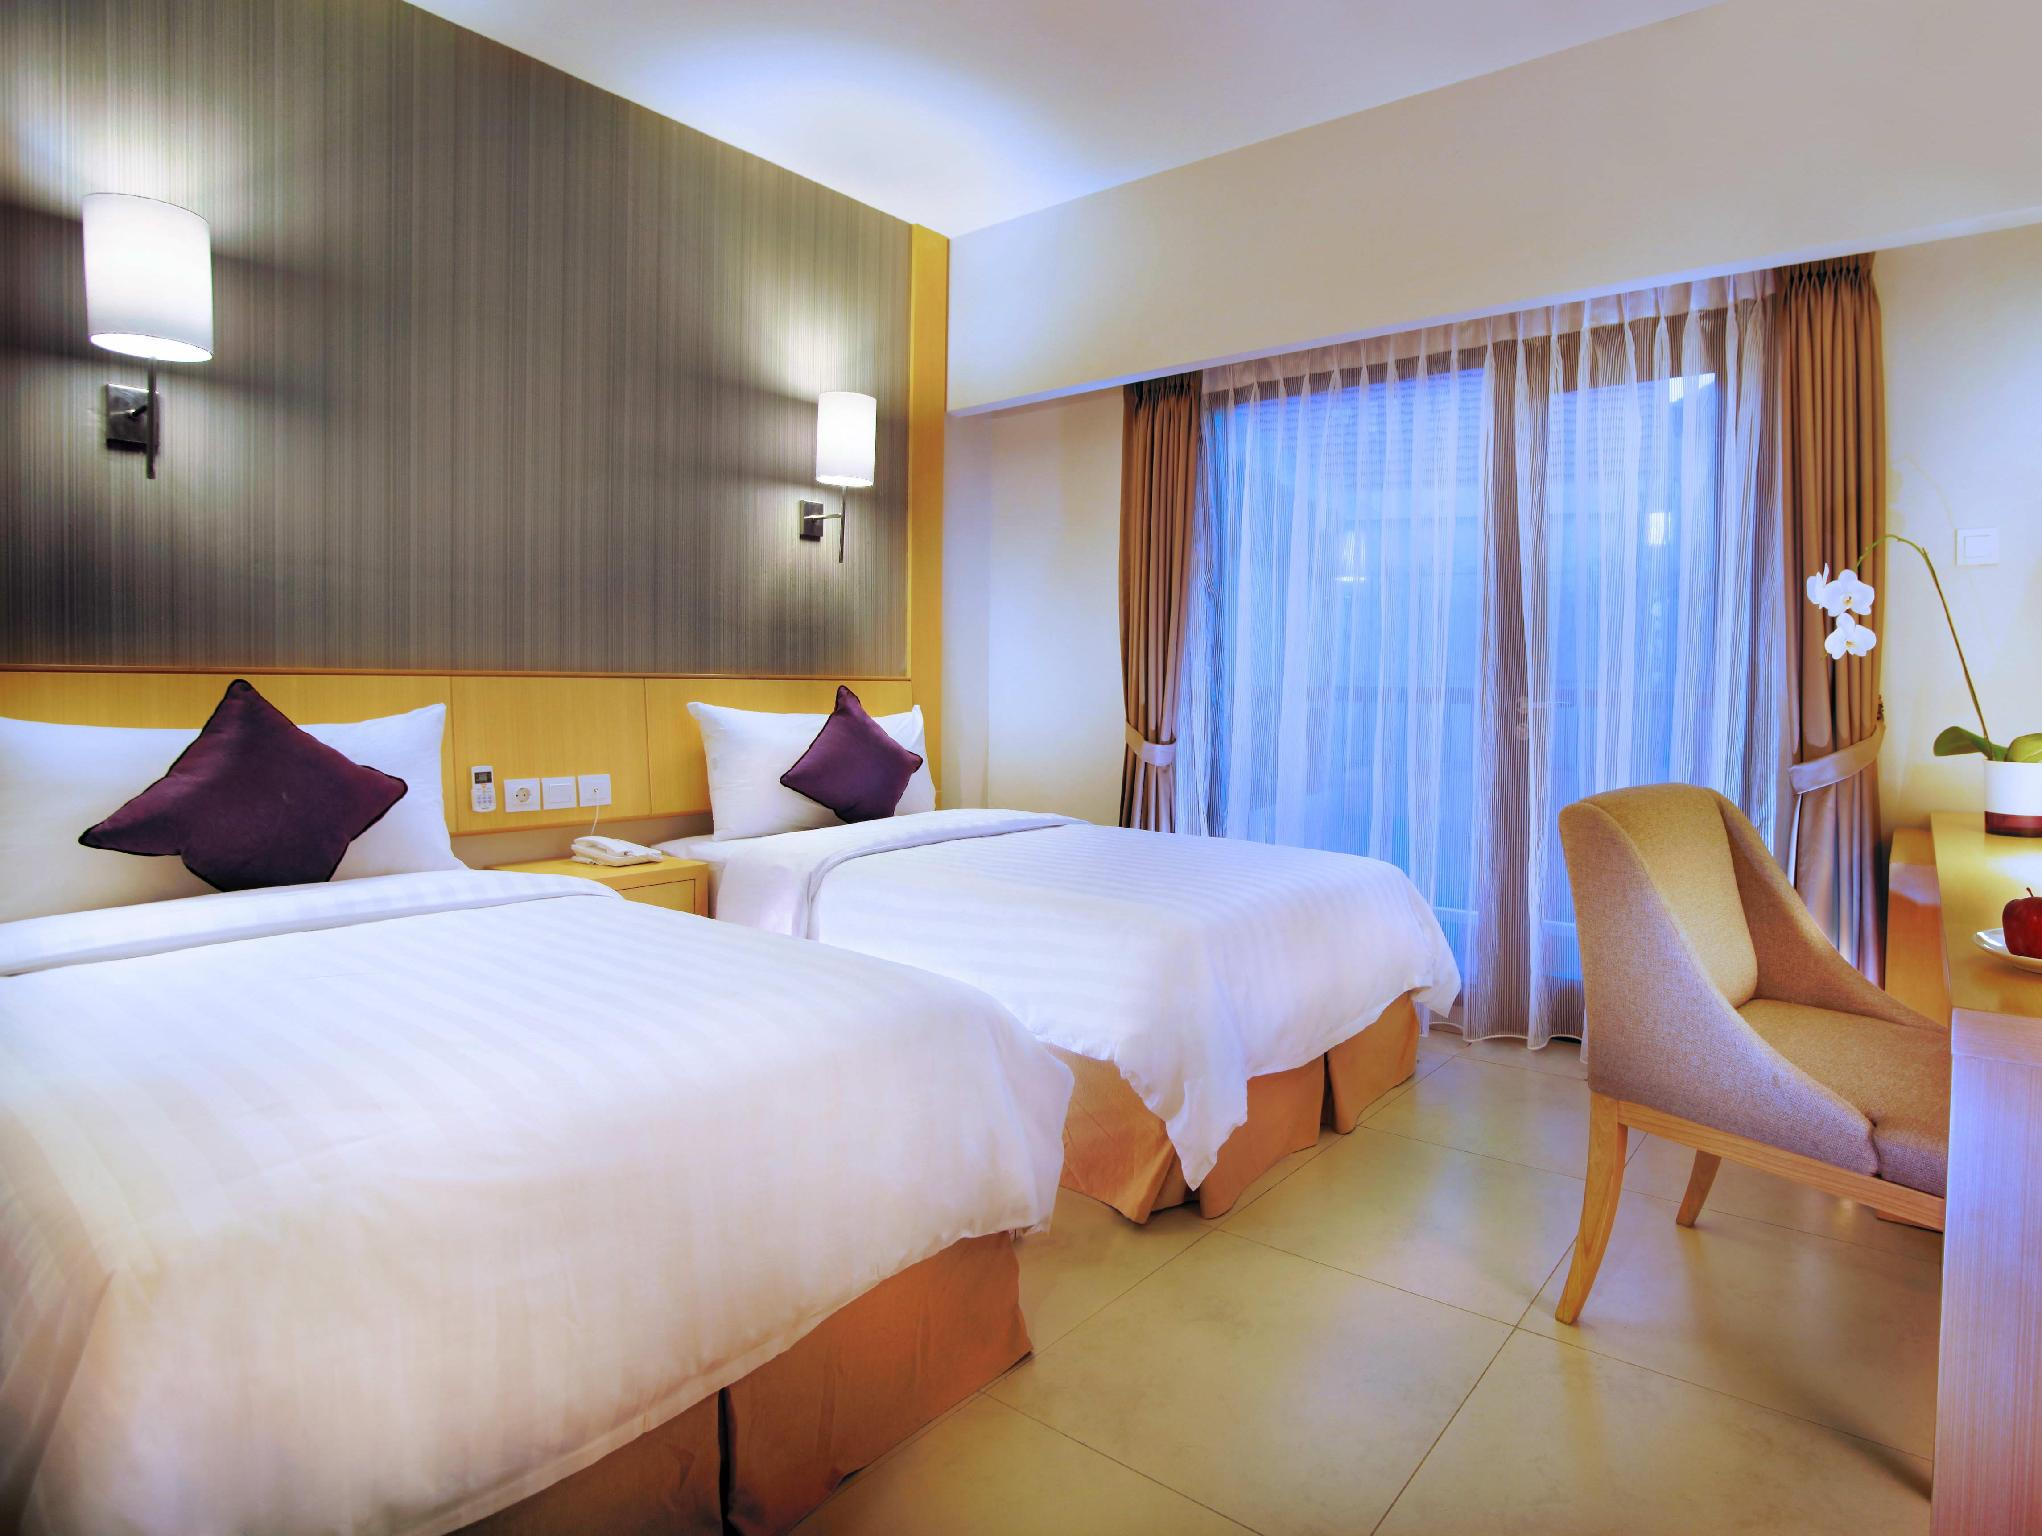 quest hotel kuta bali indonesia photos room rates promotions rh agoda com